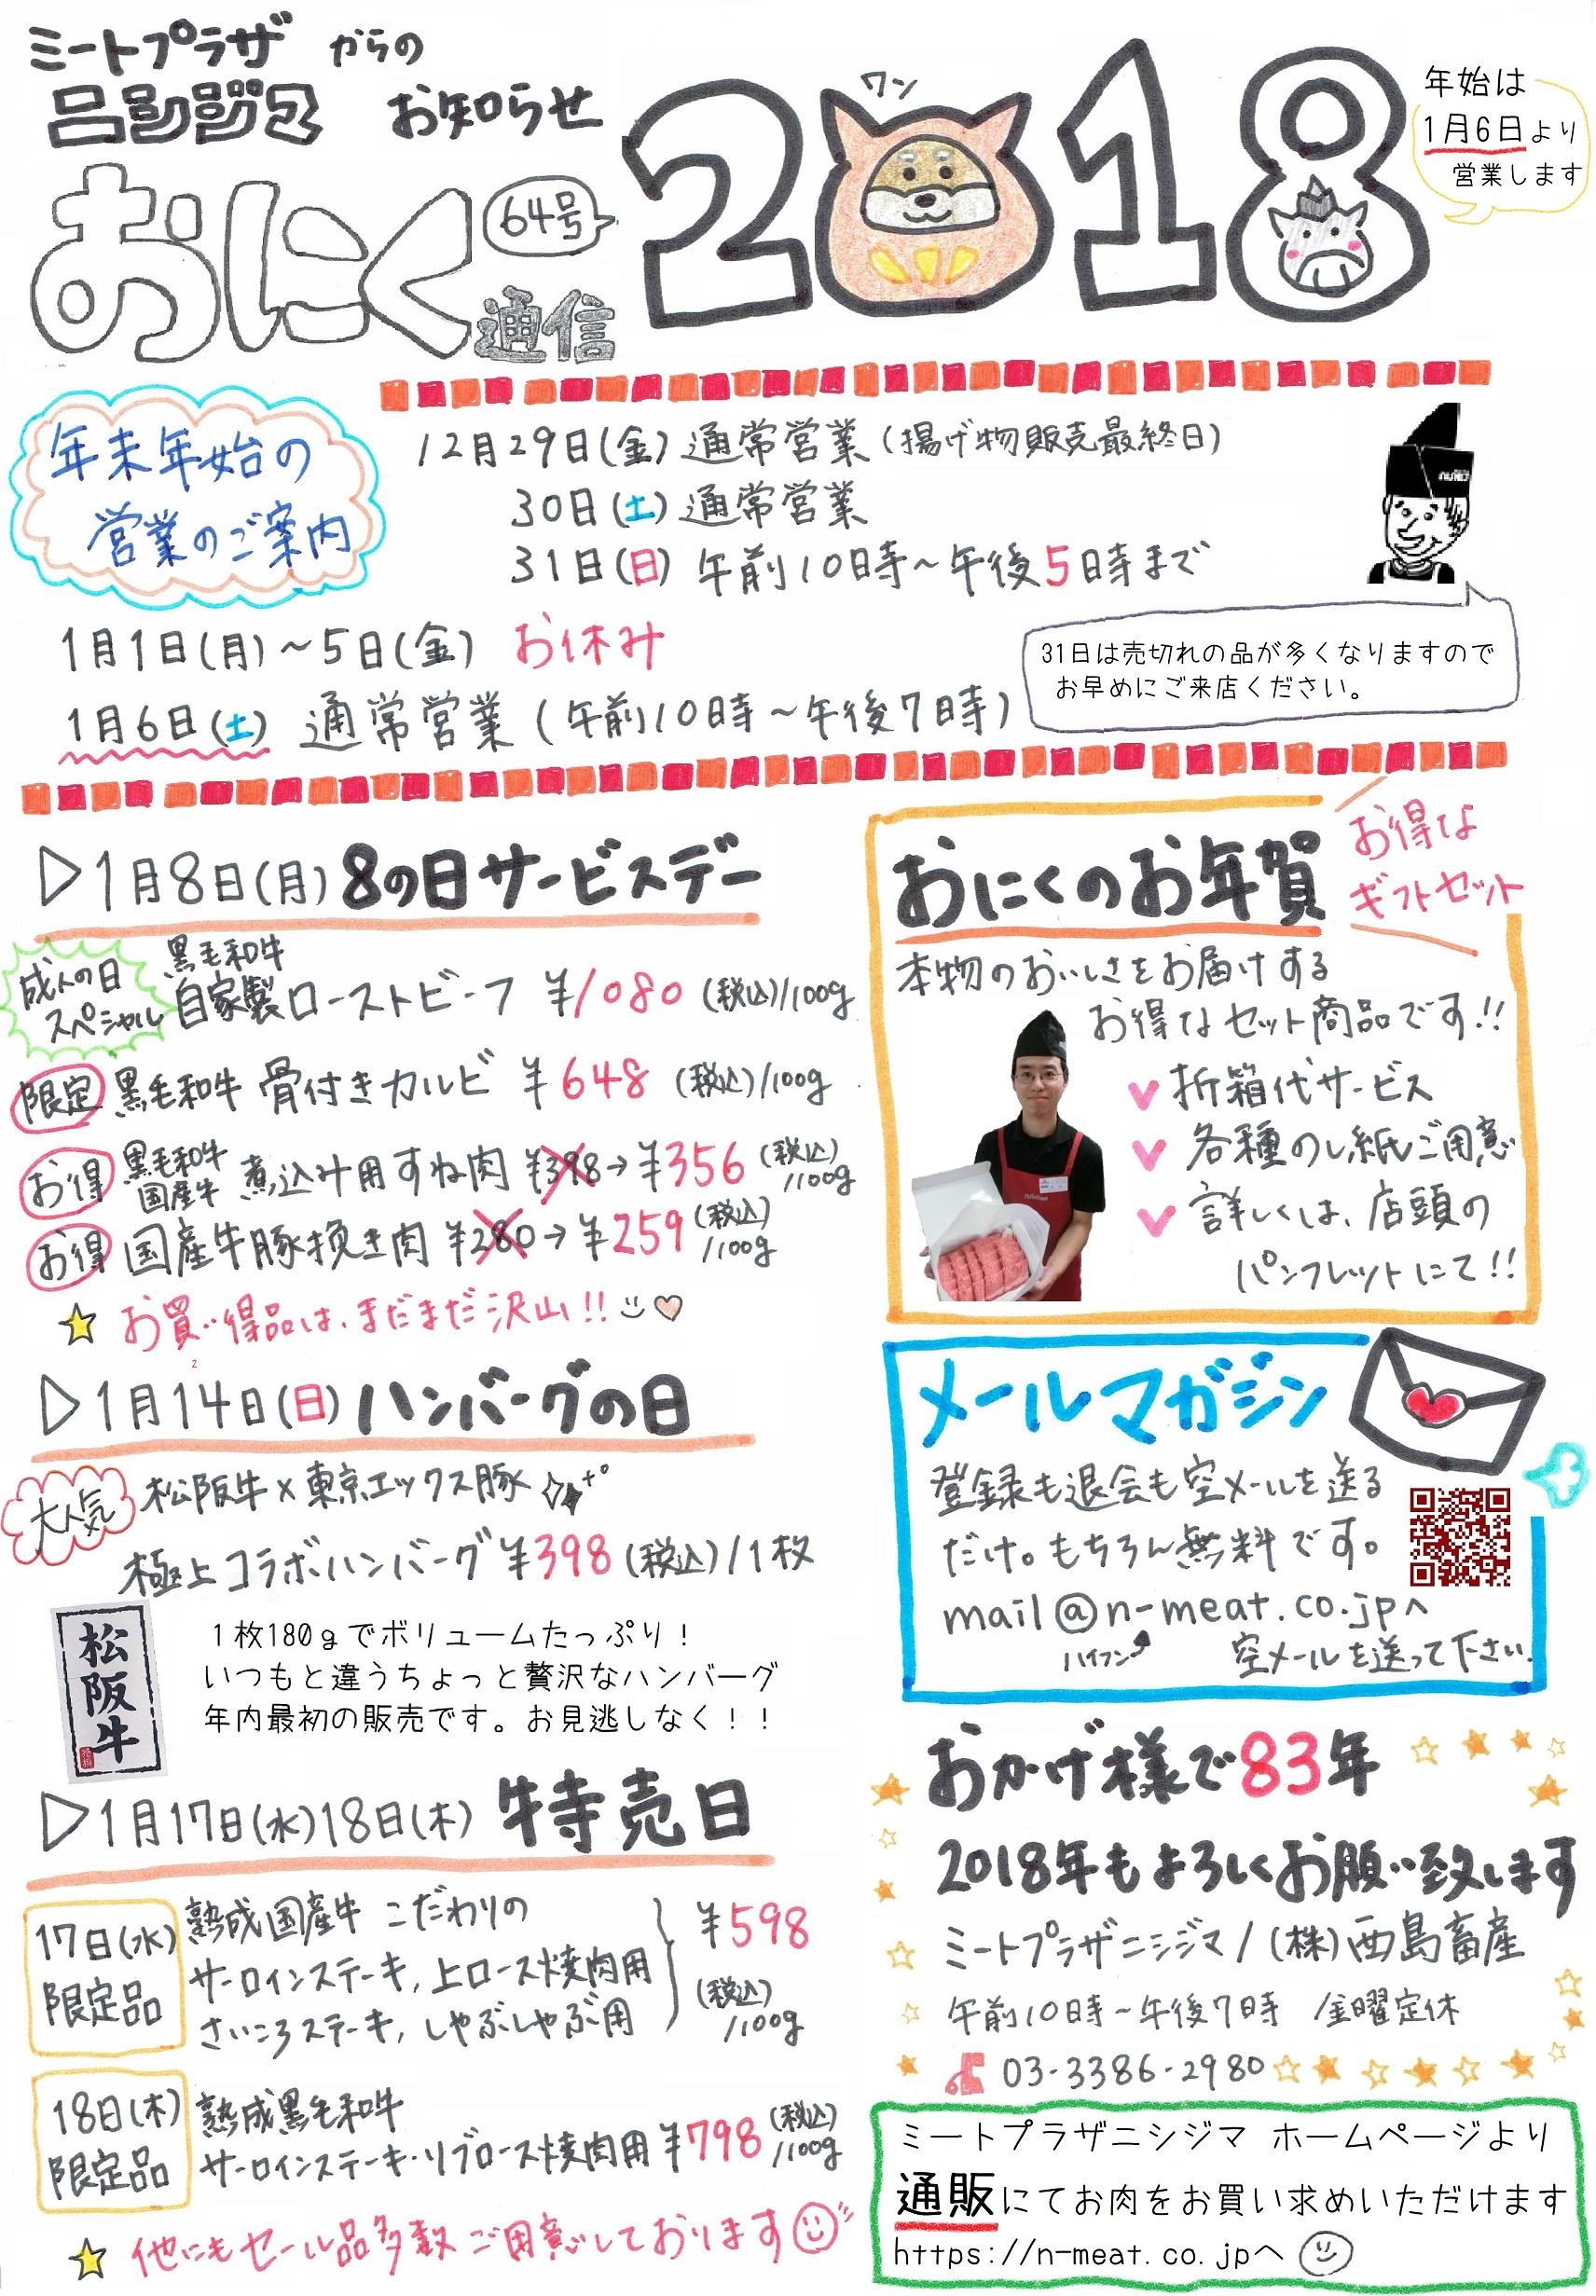 onikutsushin58